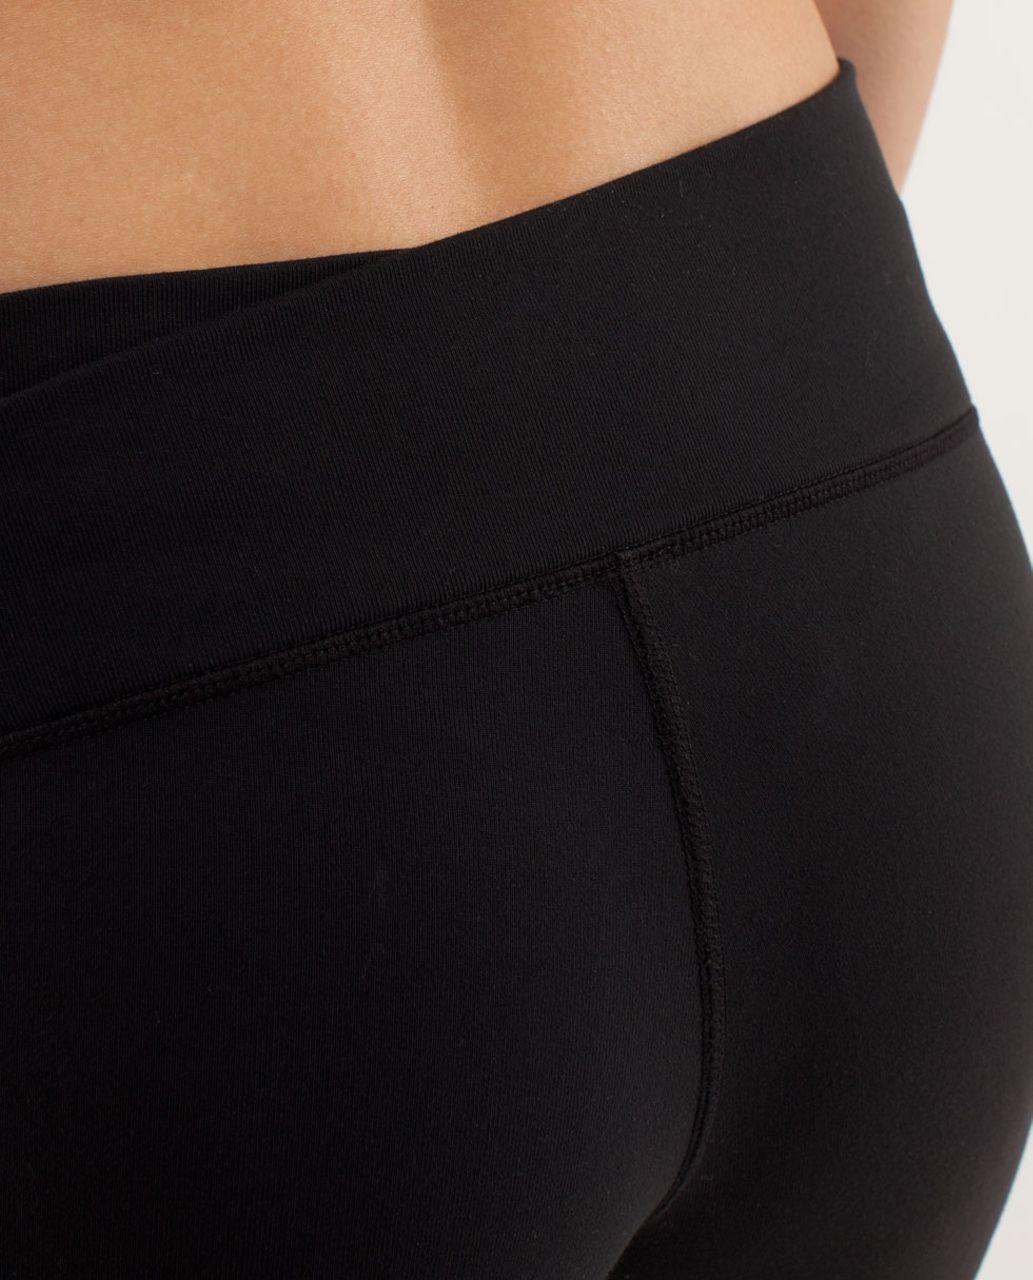 Lululemon Astro Pant (Regular) - Black